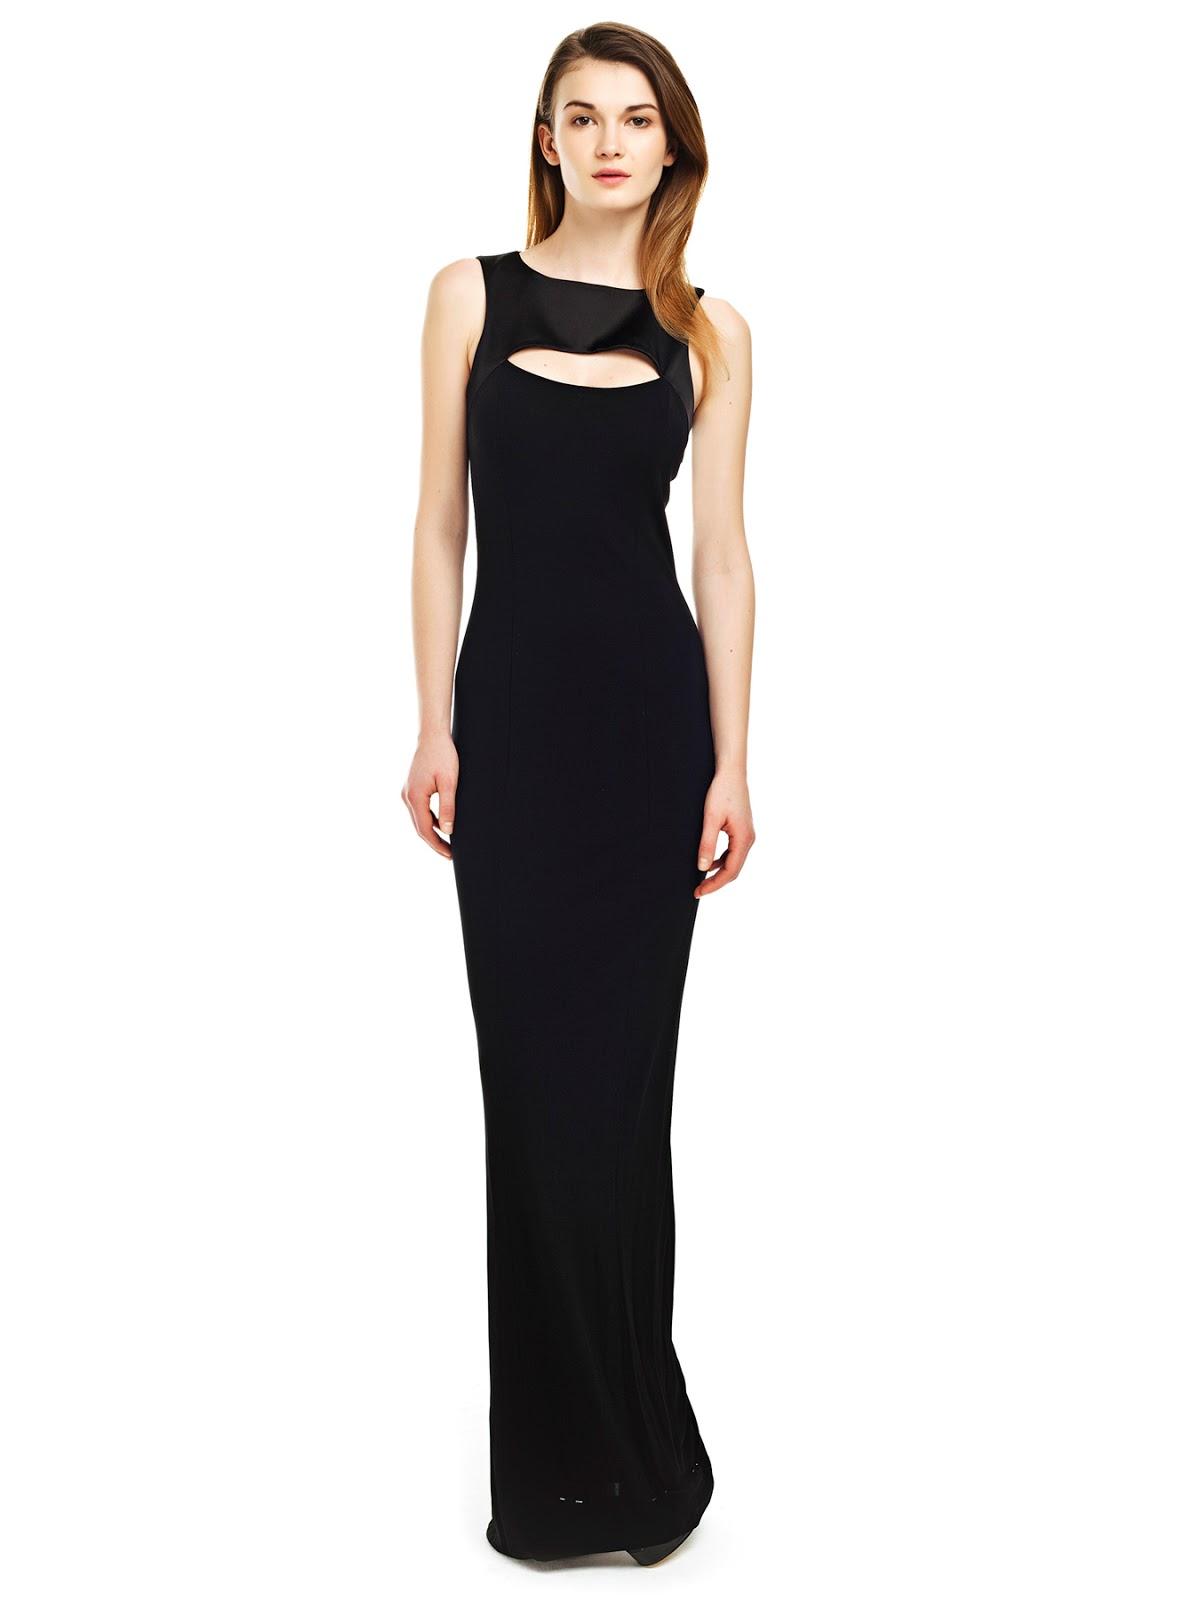 A Kesim Siyah Abiye Elbise Modelleri